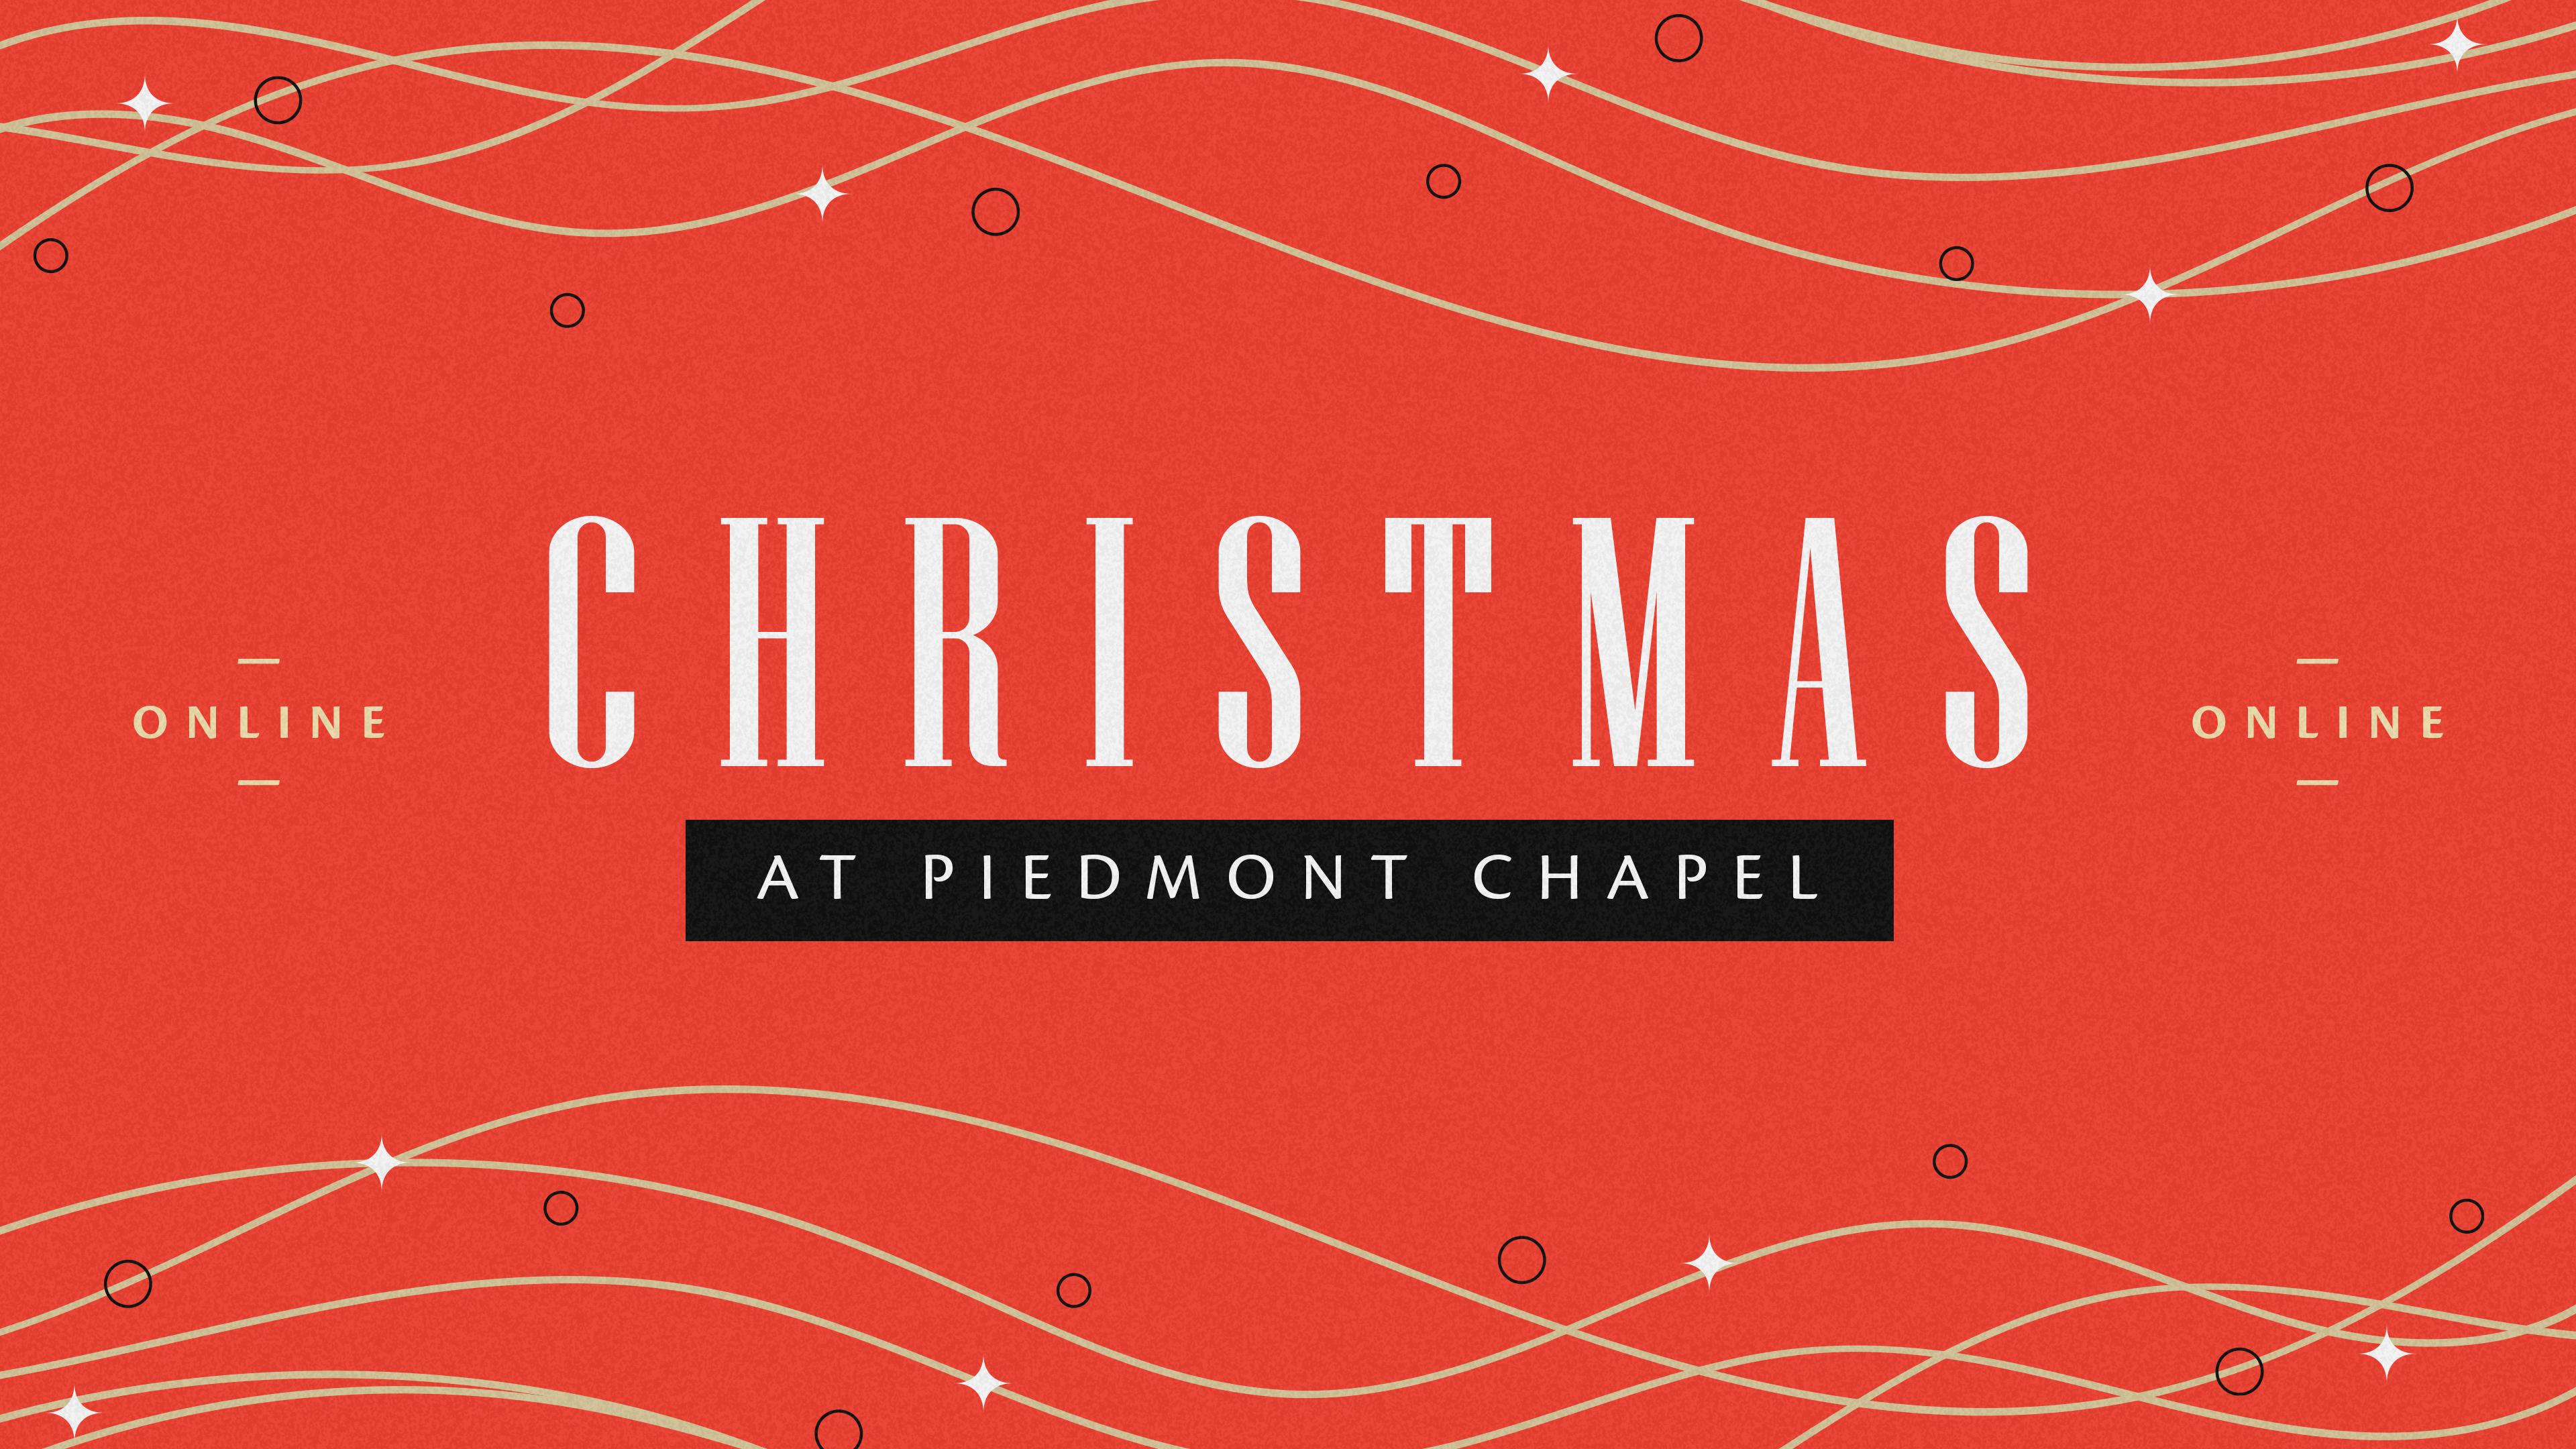 Christmas at Piedmont Chapel 2020